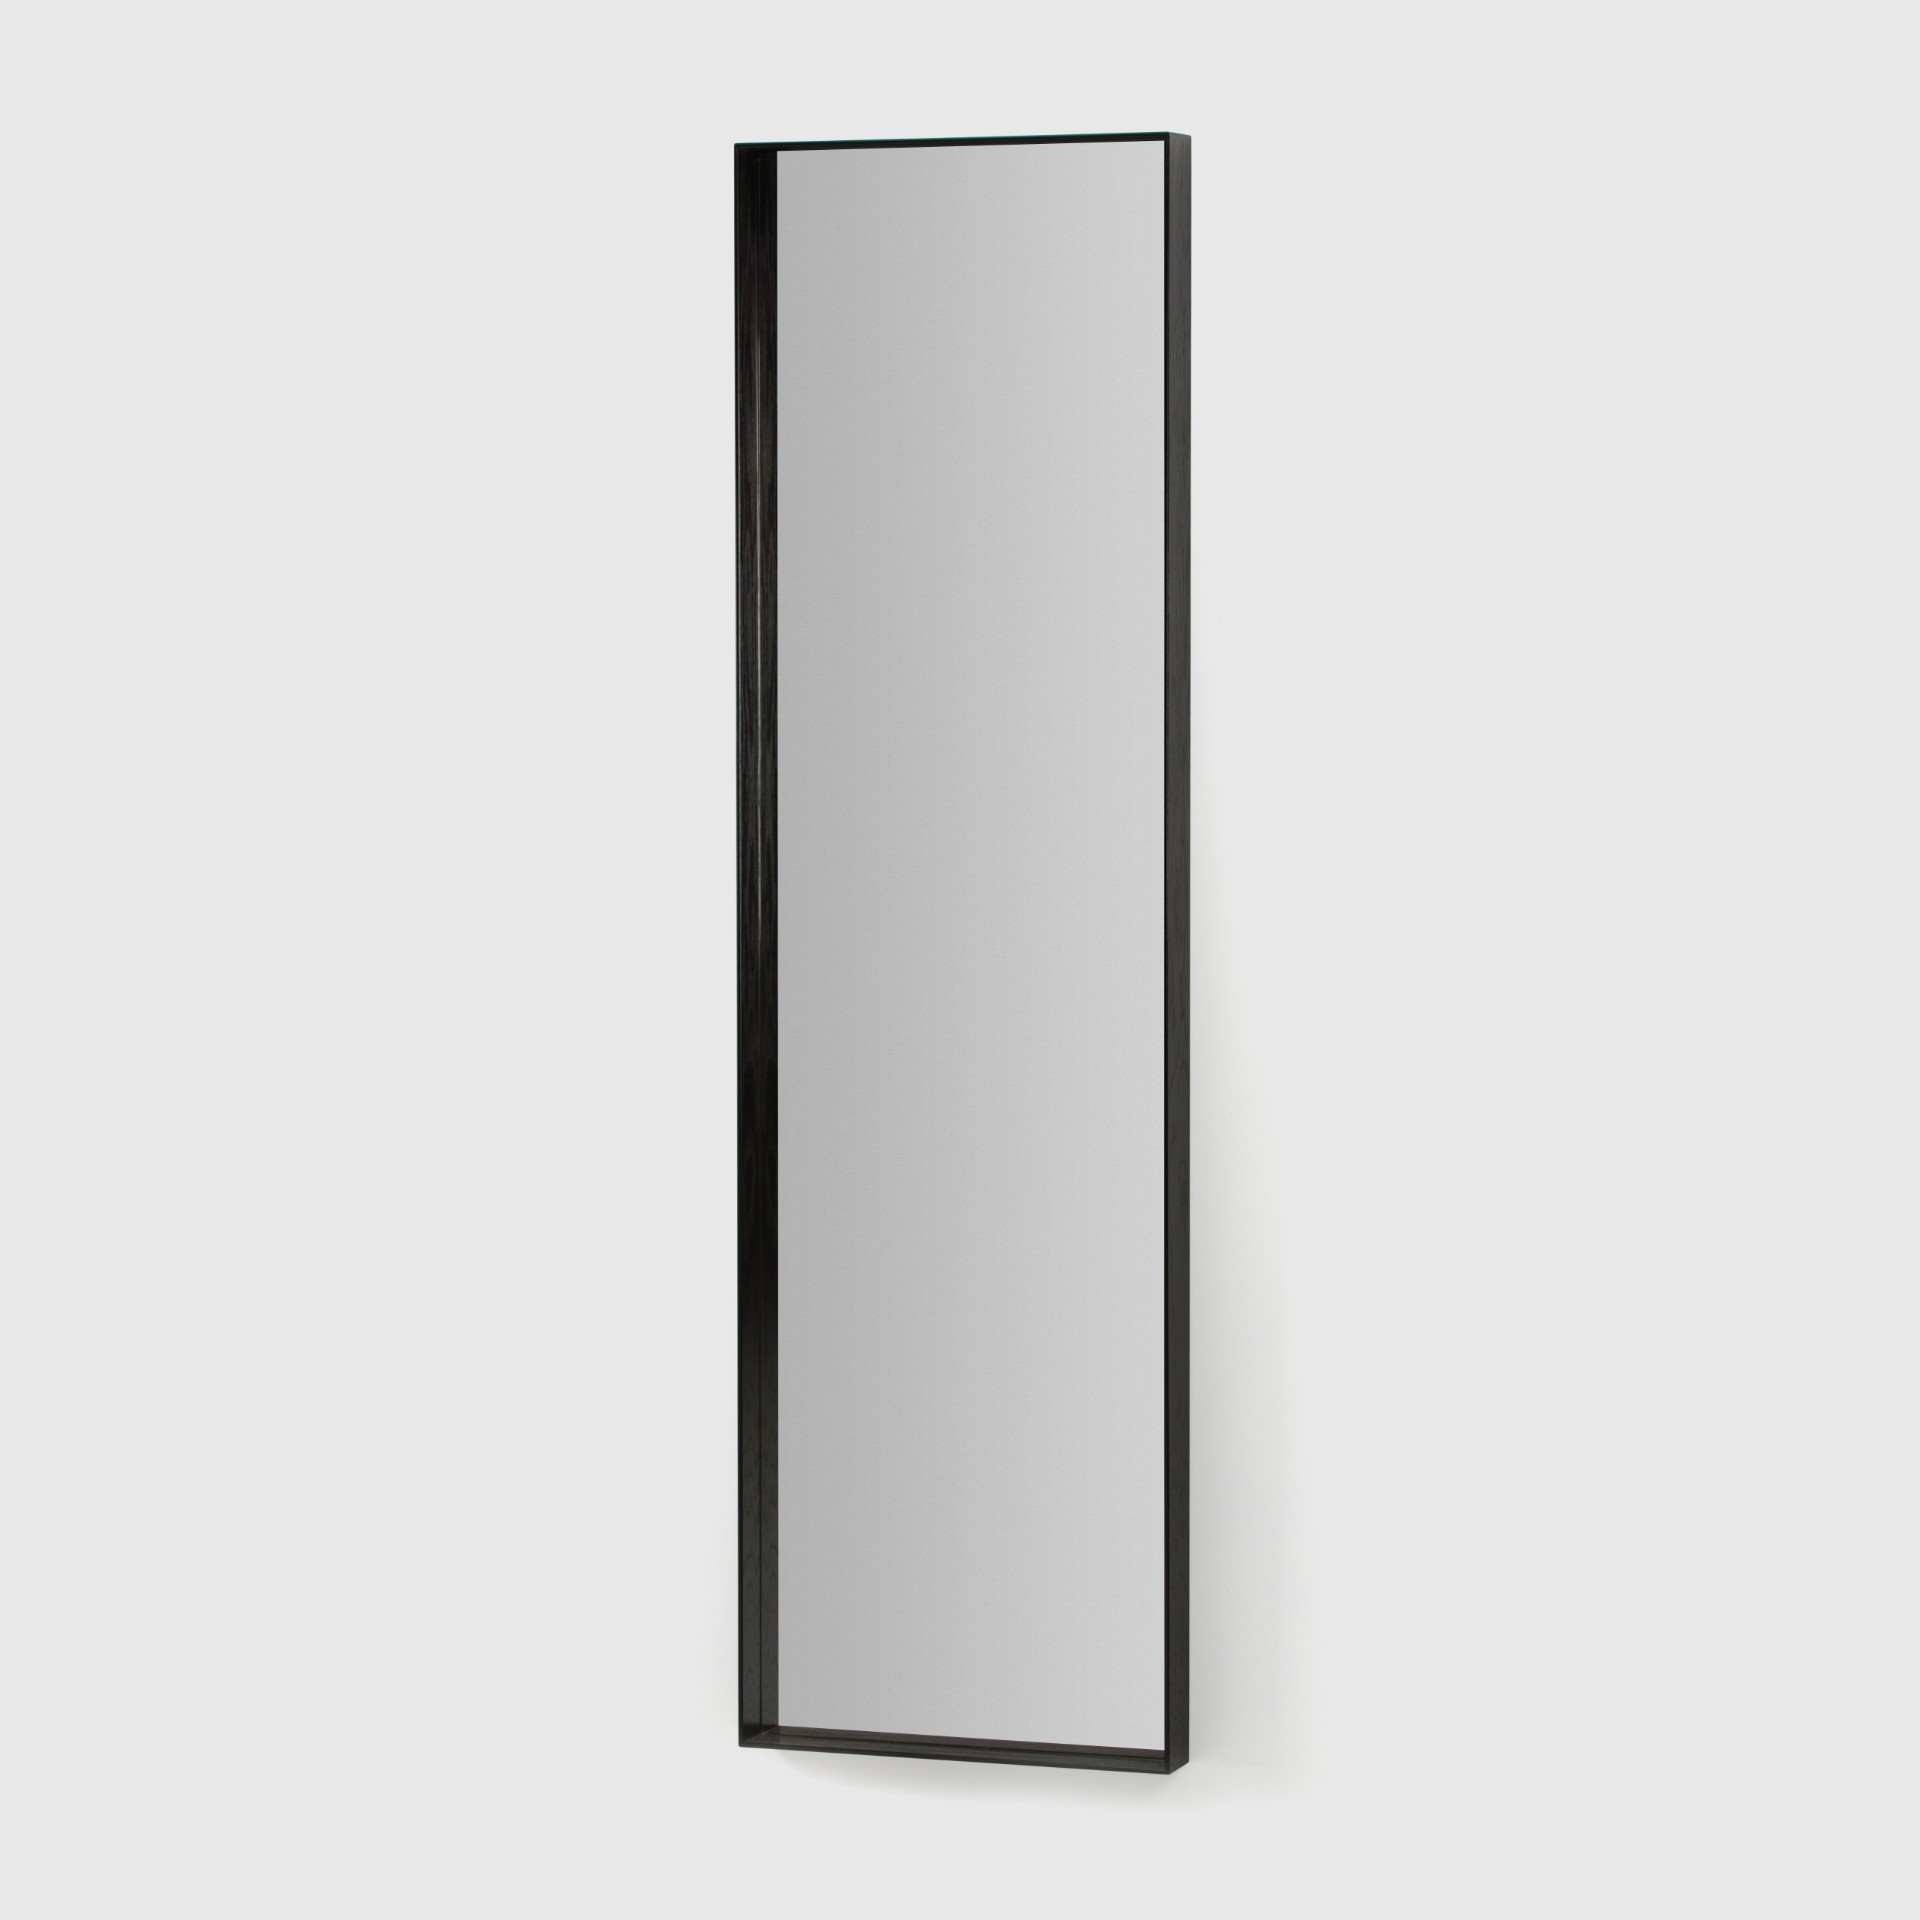 Spegel_7_svart